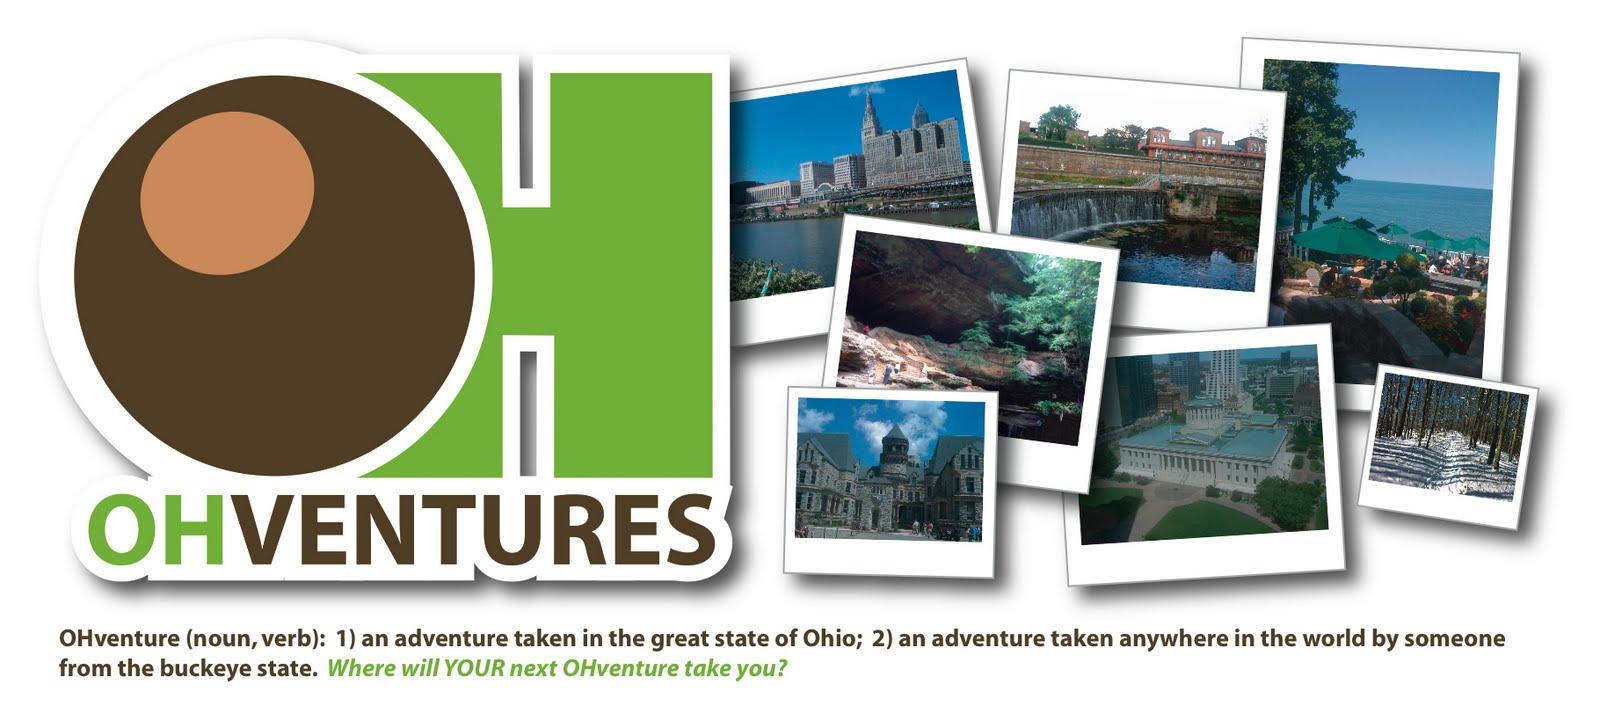 OHventures